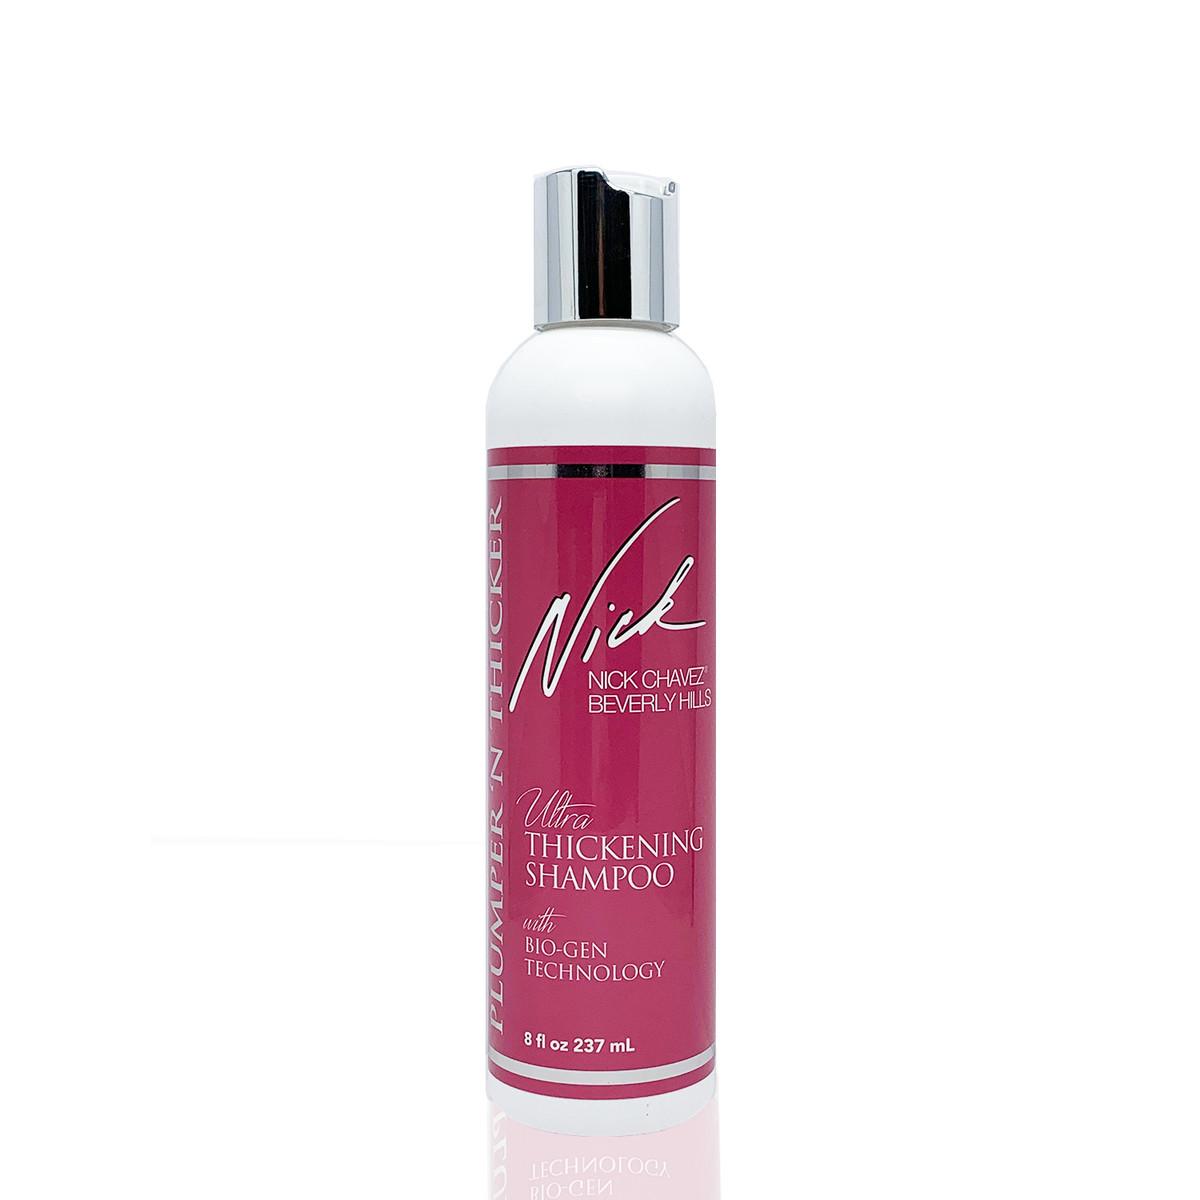 8oz Plumper N Thicker Ultra Thickening Shampoo